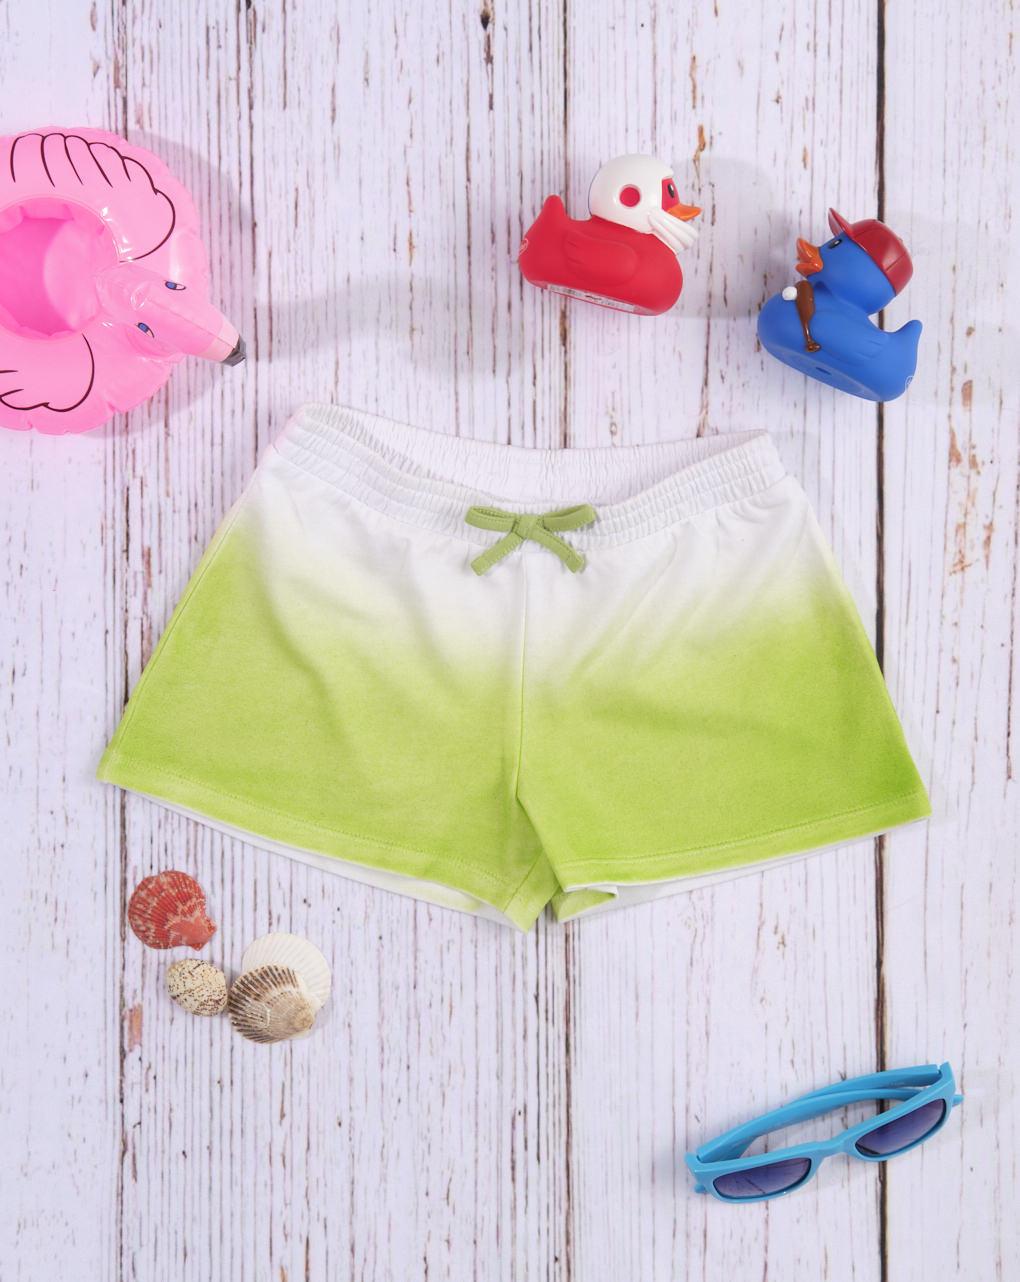 Shorts de jersey branco / verde com efeito gradiente - Prénatal